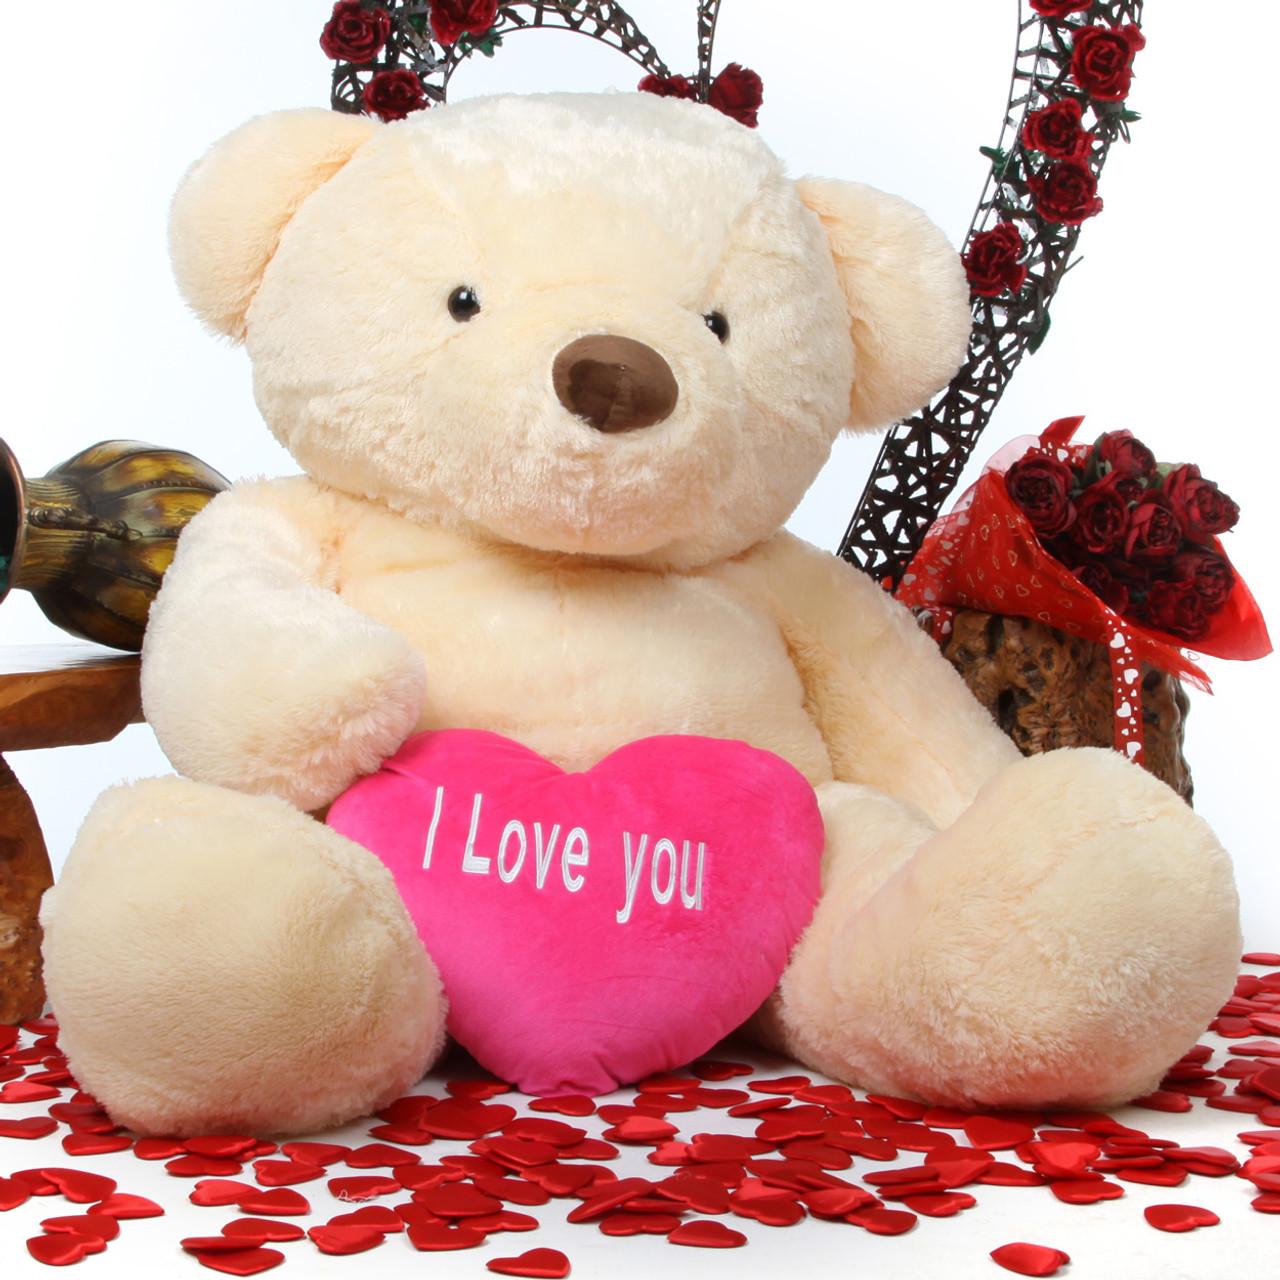 smiley love cuddles 55 cream teddy bear w i love you heart giant